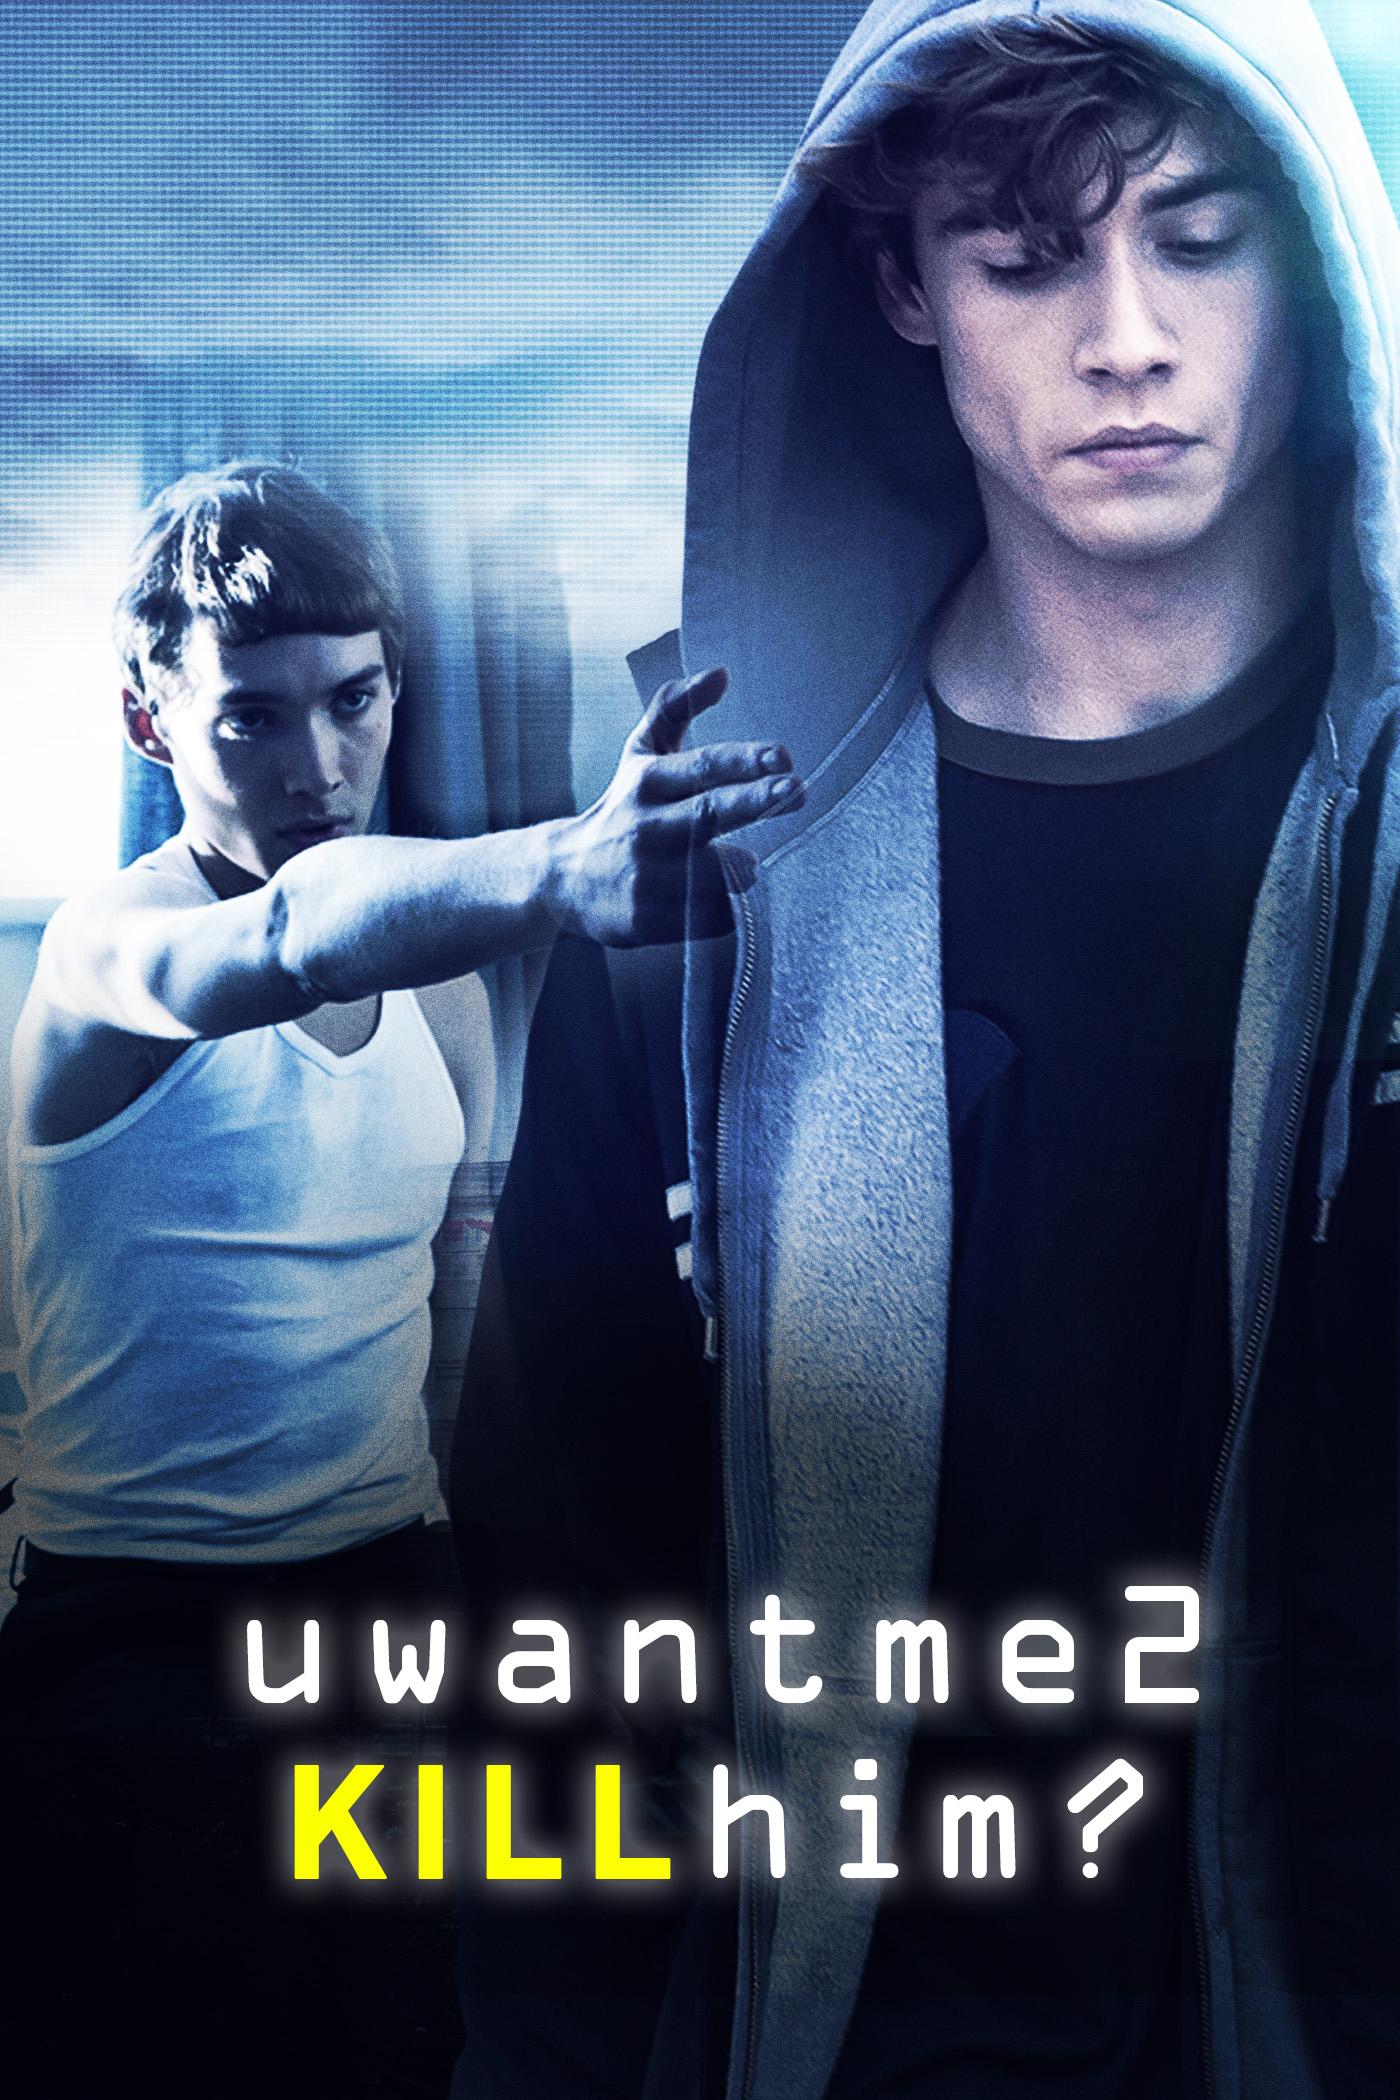 UWANTME2KILLHIM? movie poster